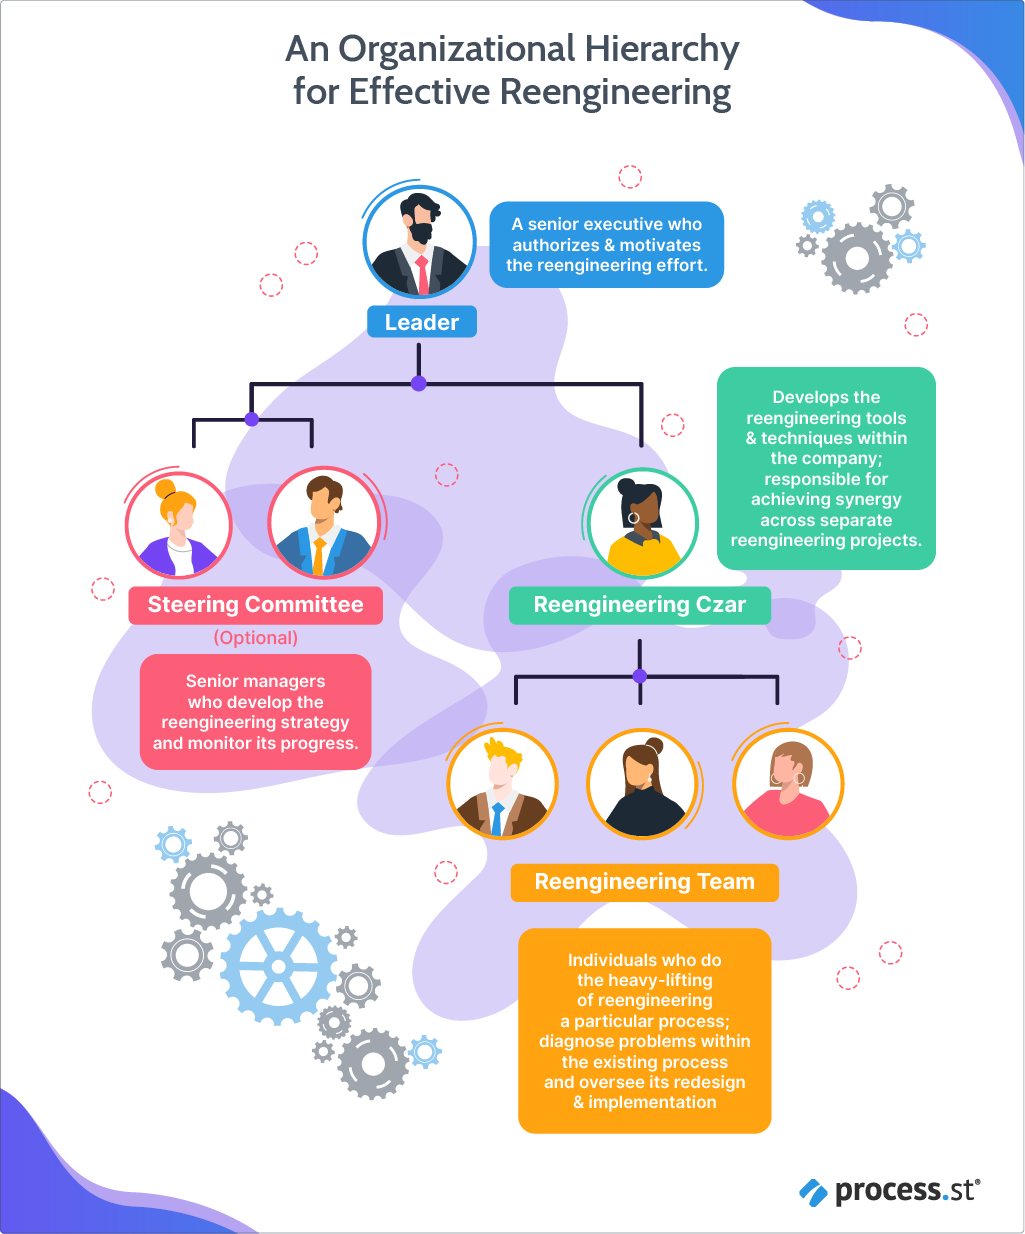 An Organizational Hierarchy